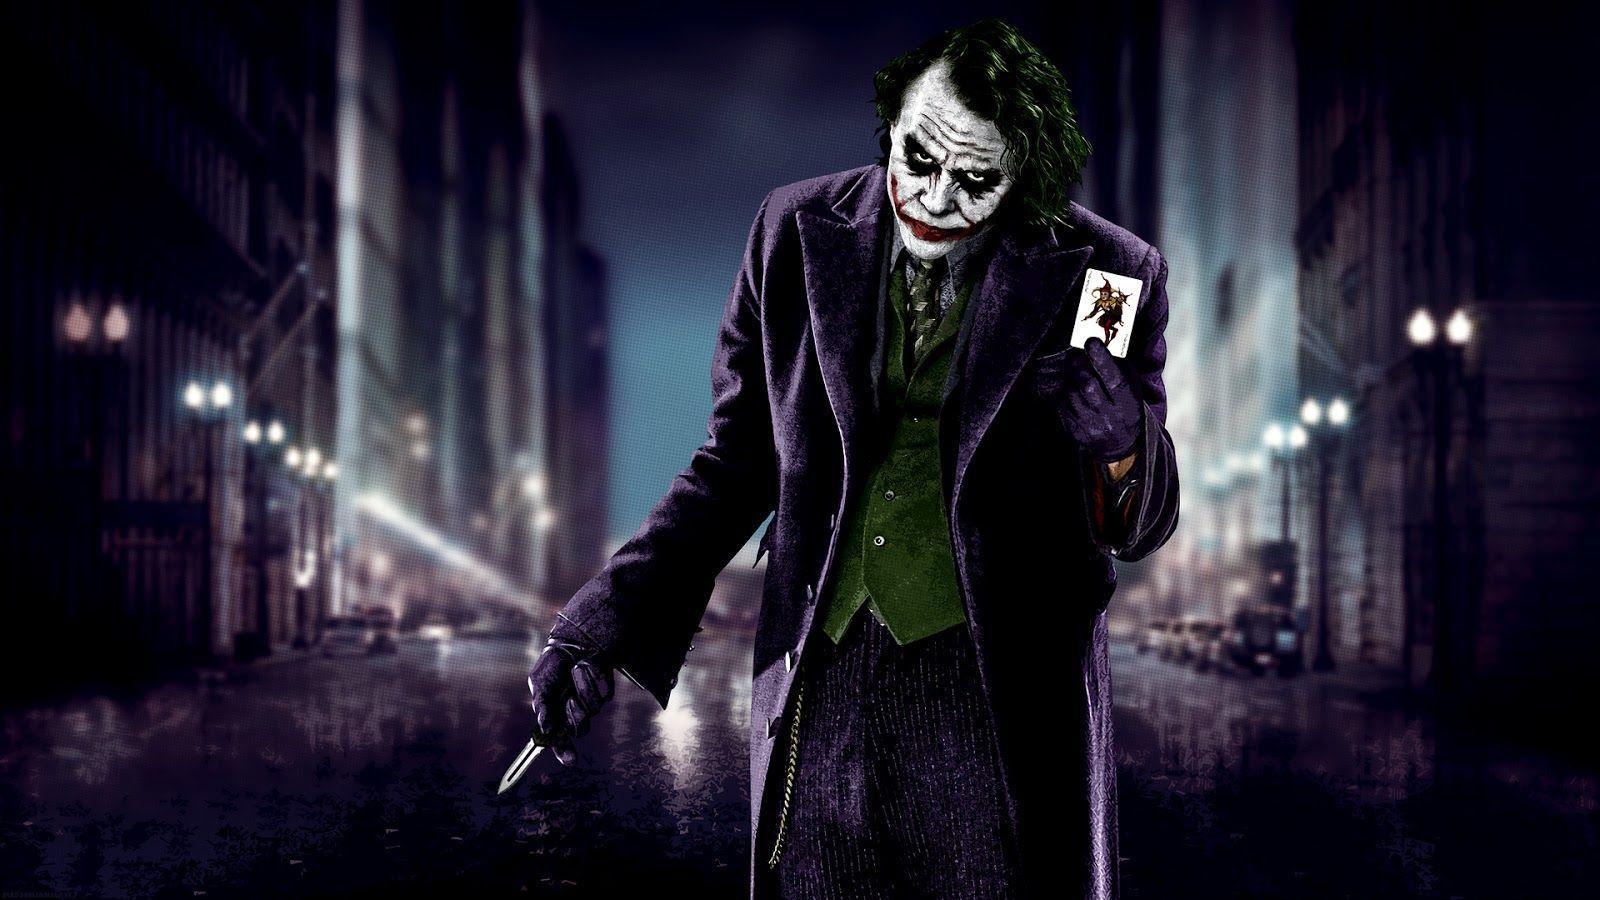 Heath Ledger Joker Wallpapers 1600x900